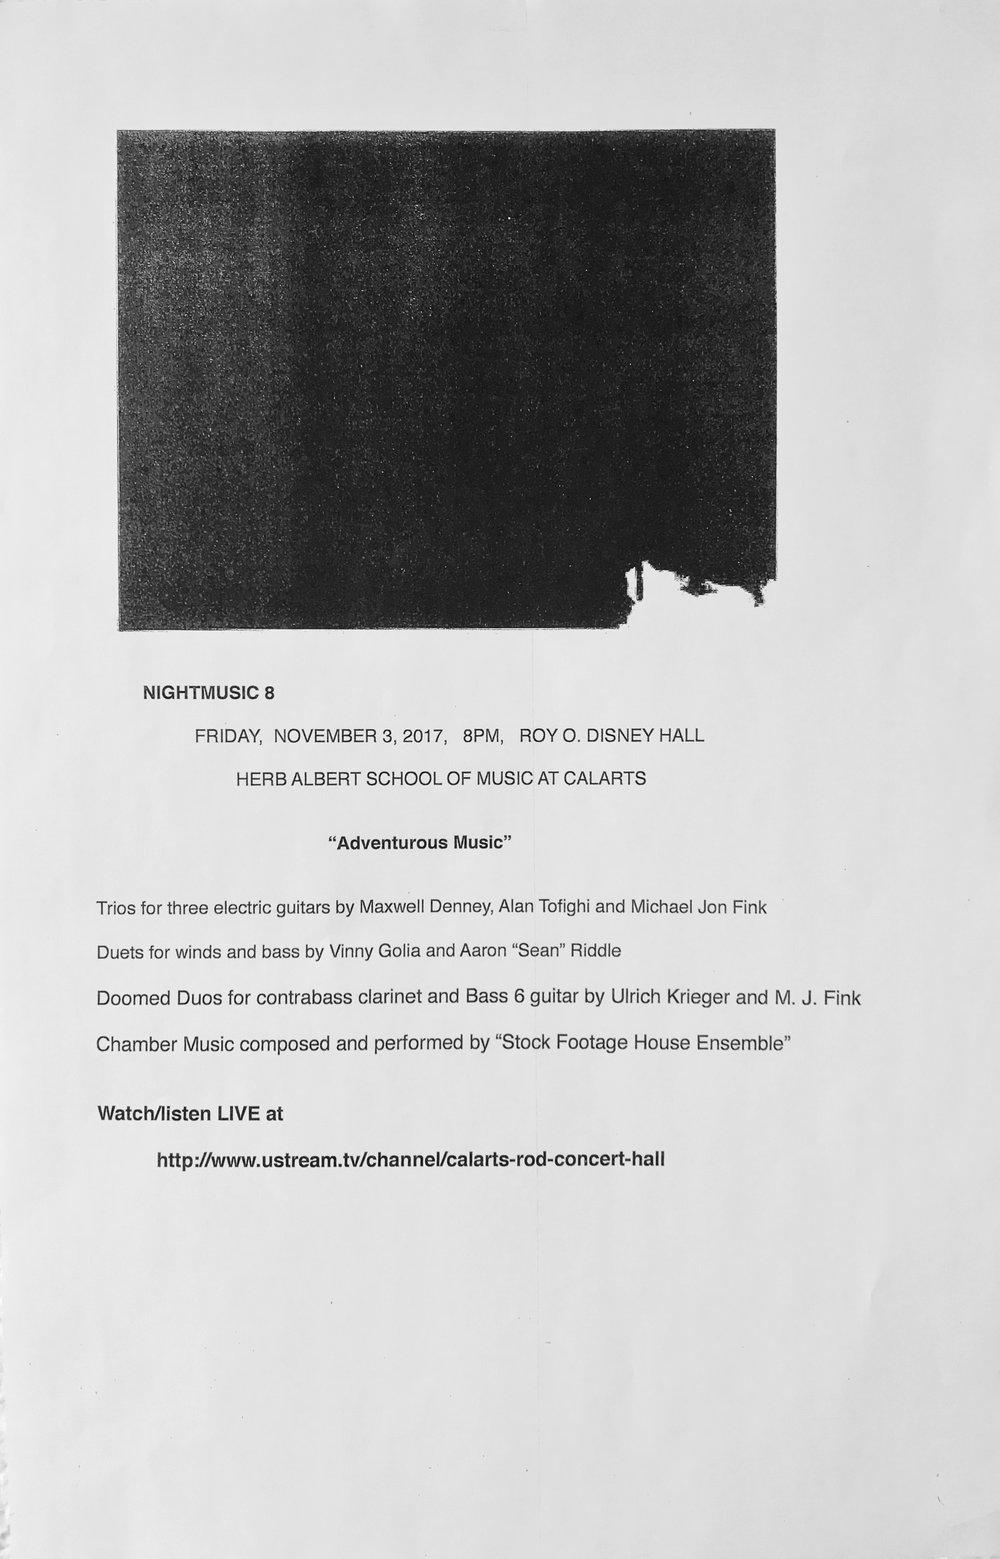 CalArts ROD, Nov 3, 2017